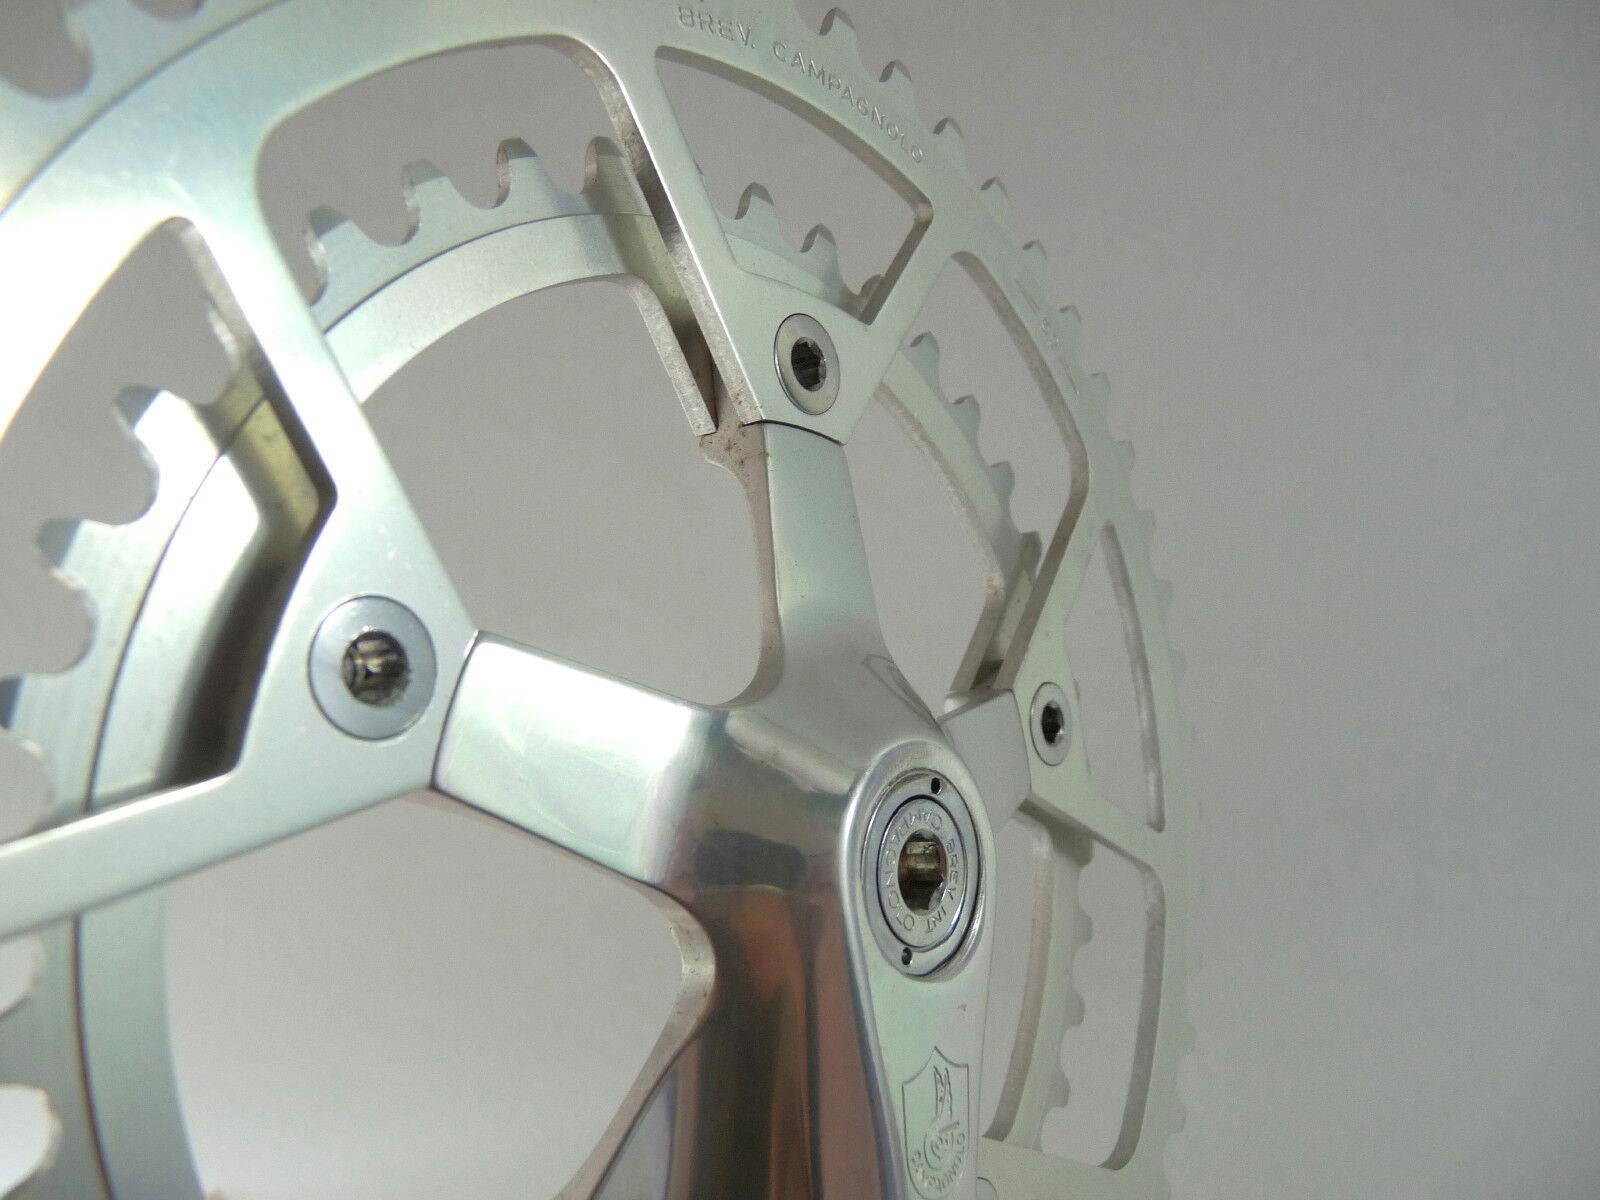 Campagnolo Victory crankset 170mm 52t 40t chainring Vintage Bike 7mm 1984' NOS